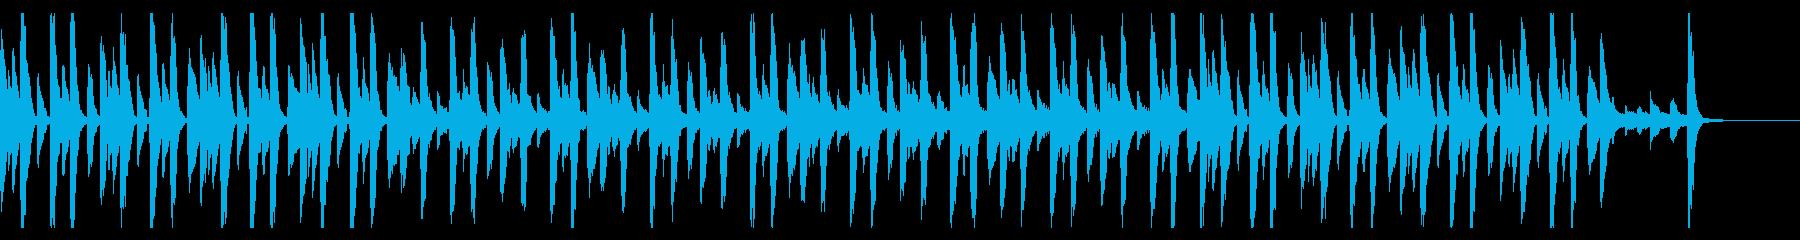 PianoStepsの再生済みの波形